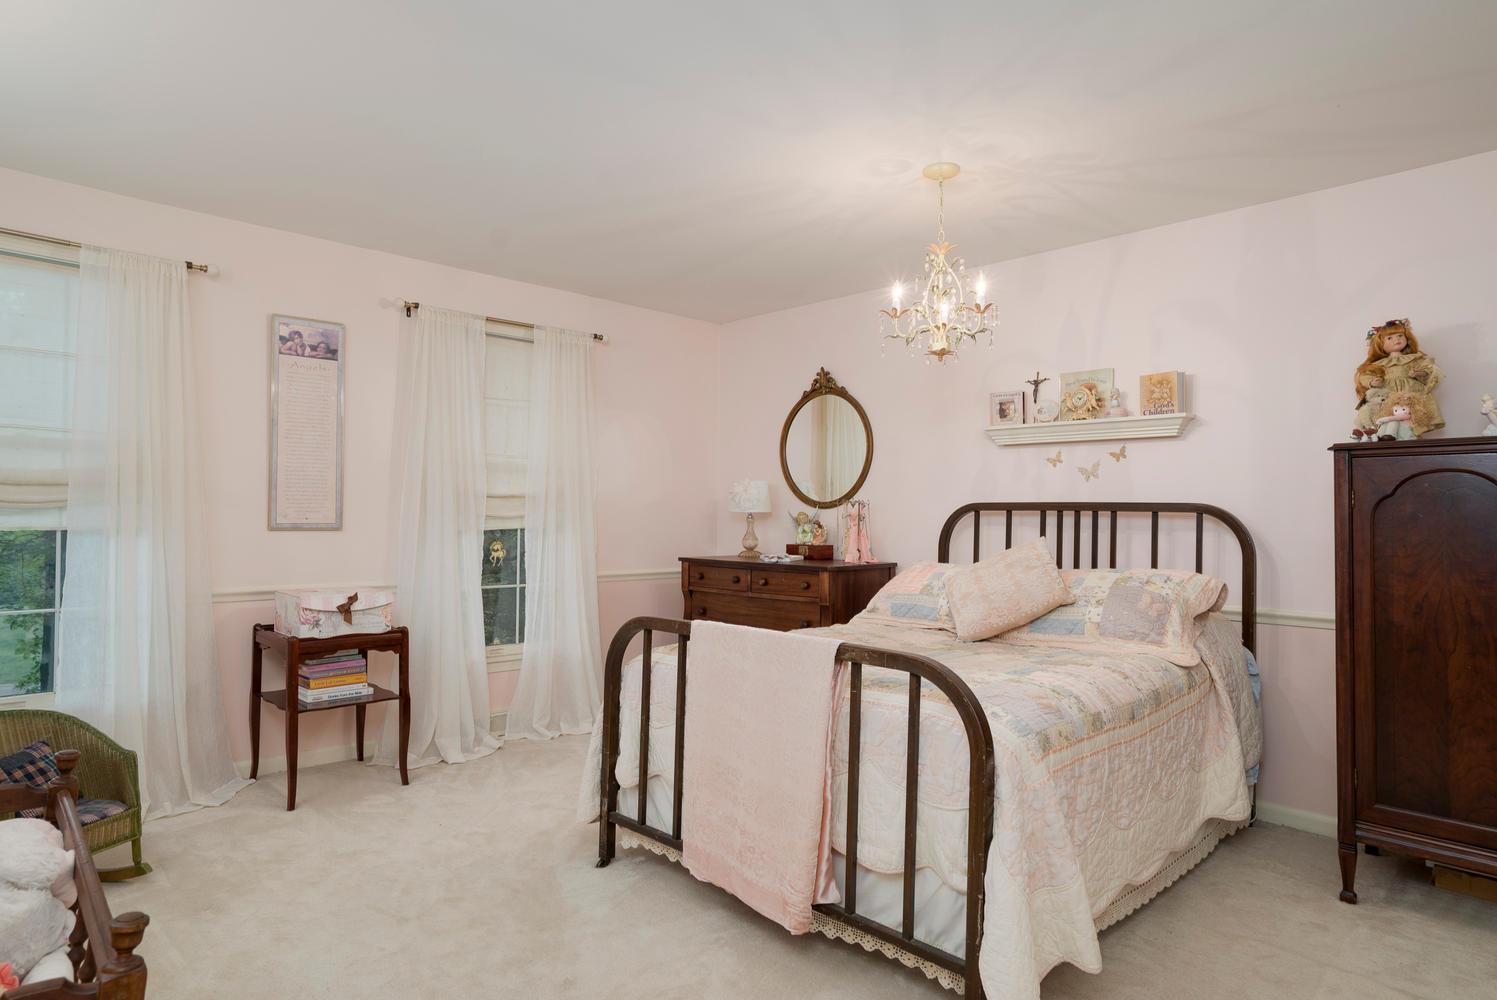 36 Timberlake Dr Orchard Park-large-016-2-Bedroom-1498x1000-72dpi